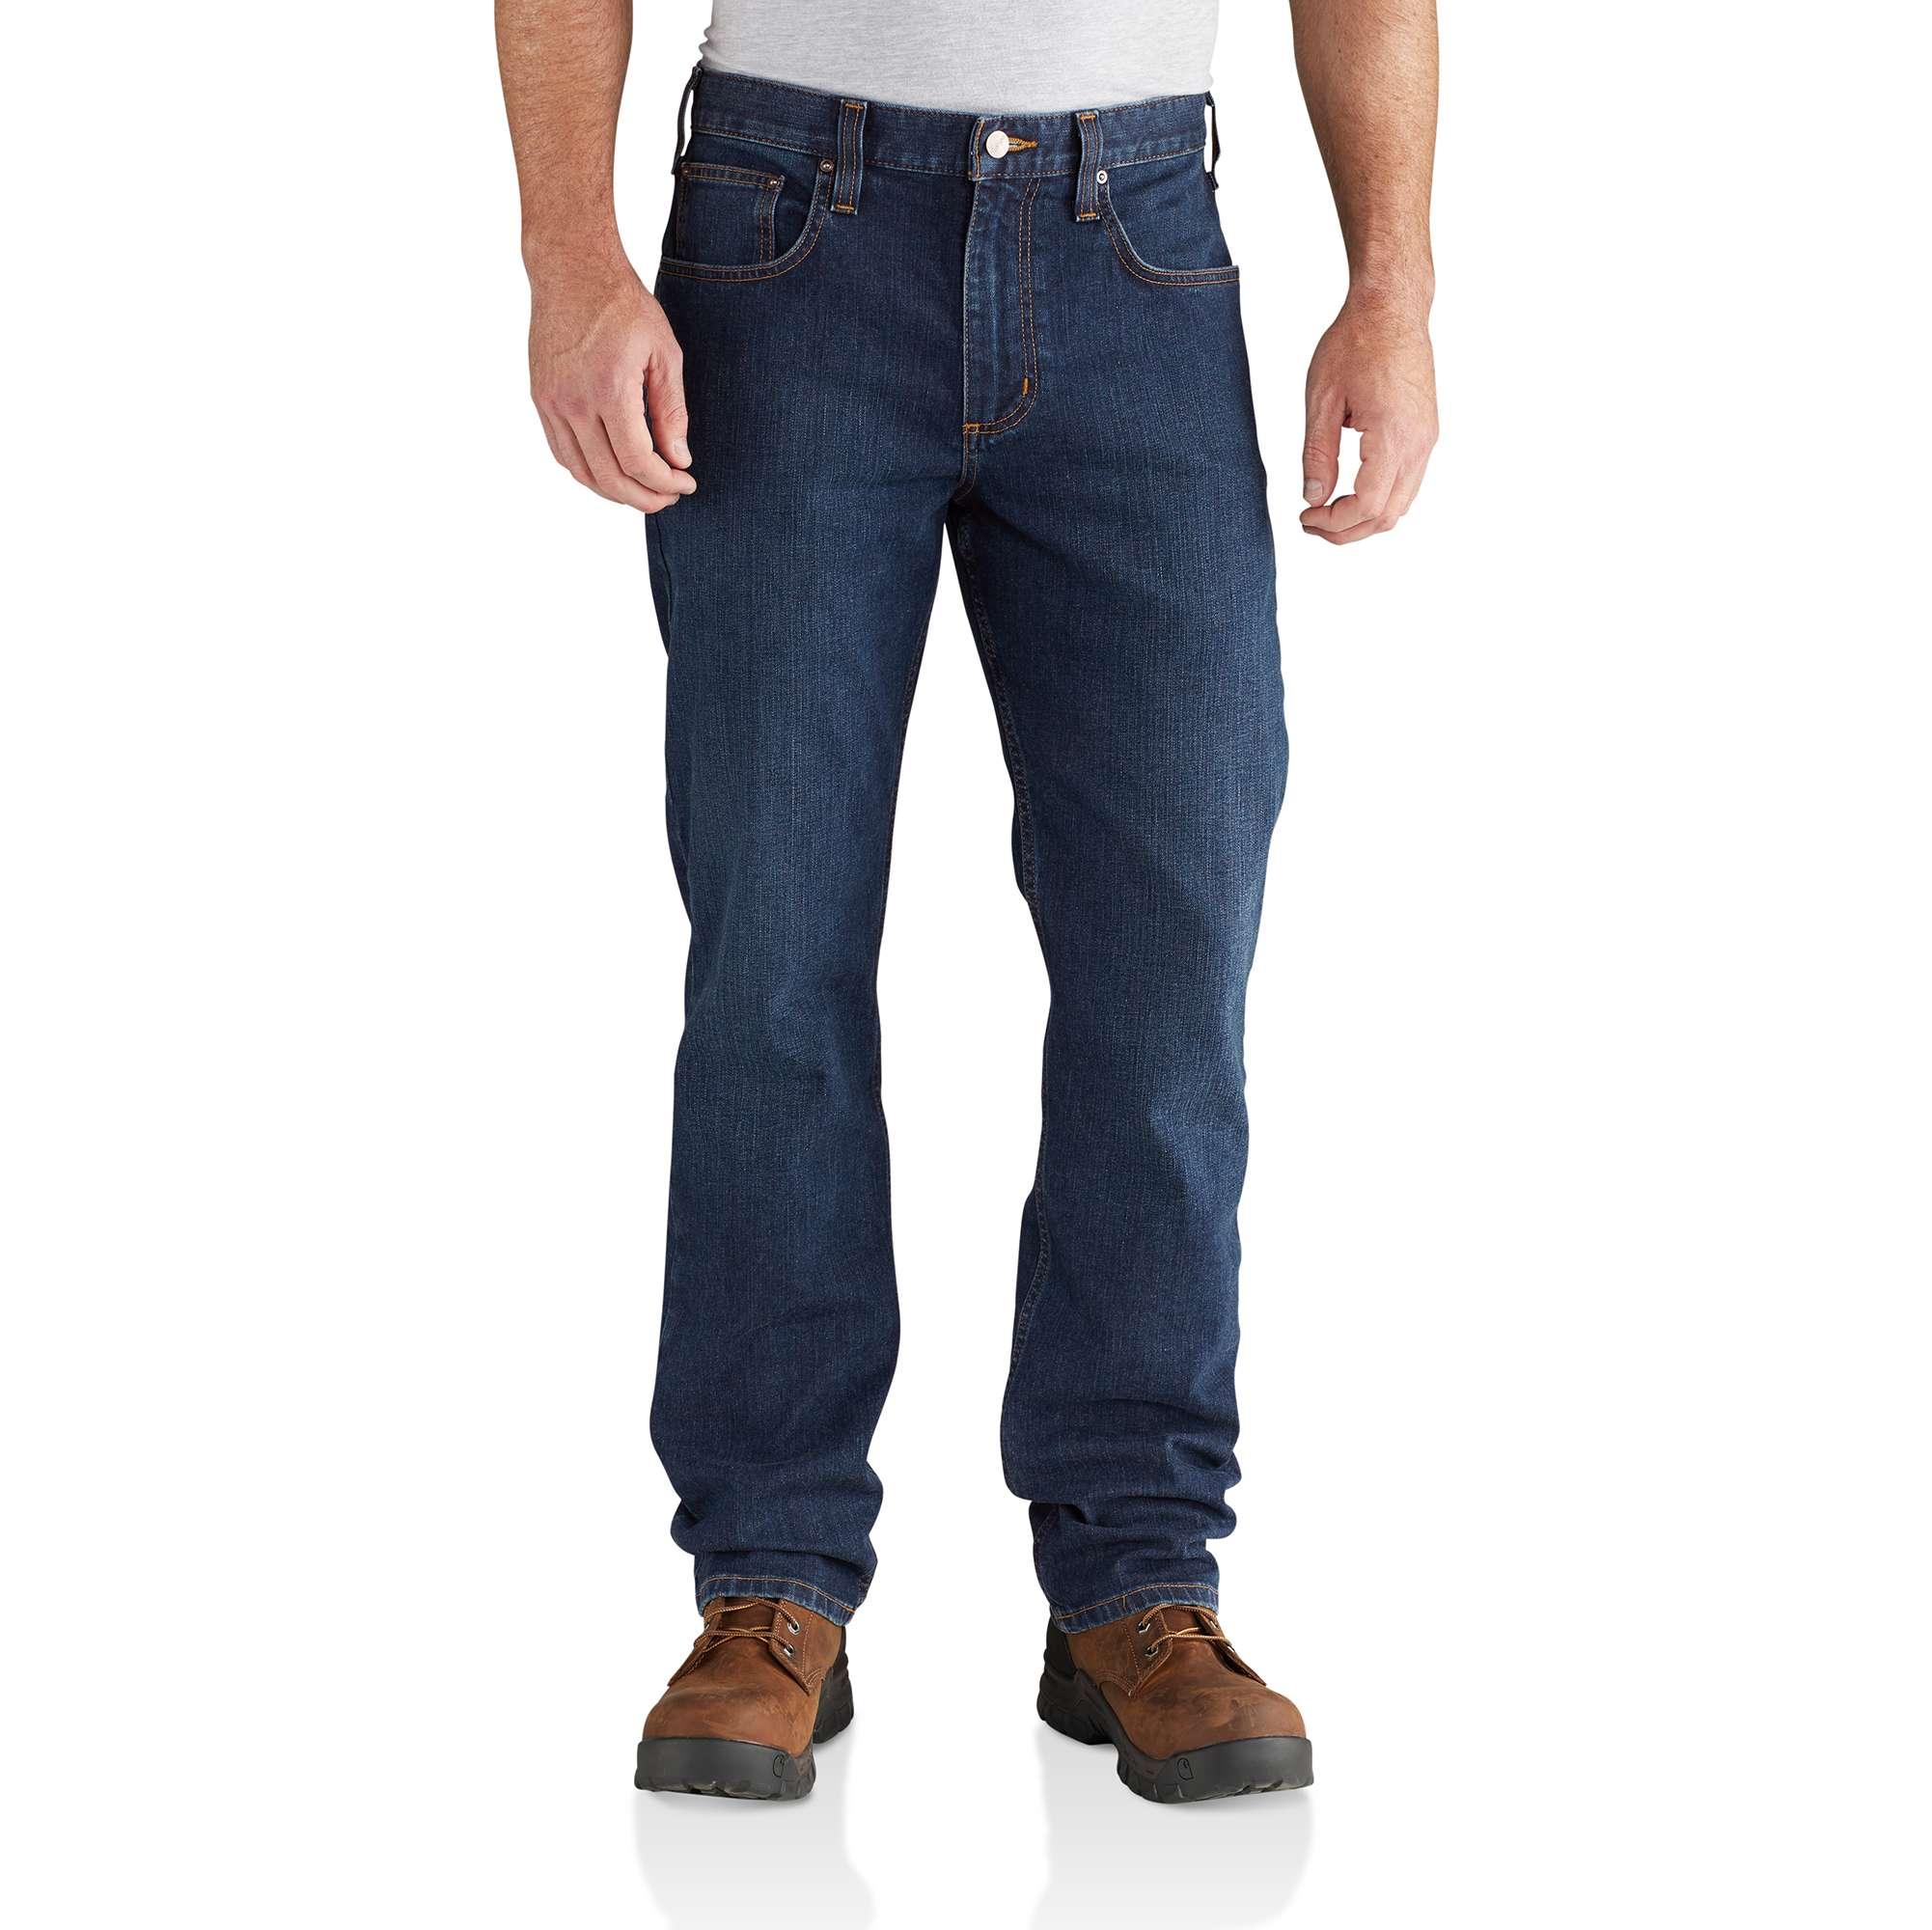 Carhartt Rugged Flex Relaxed Fit Straight Leg Jean